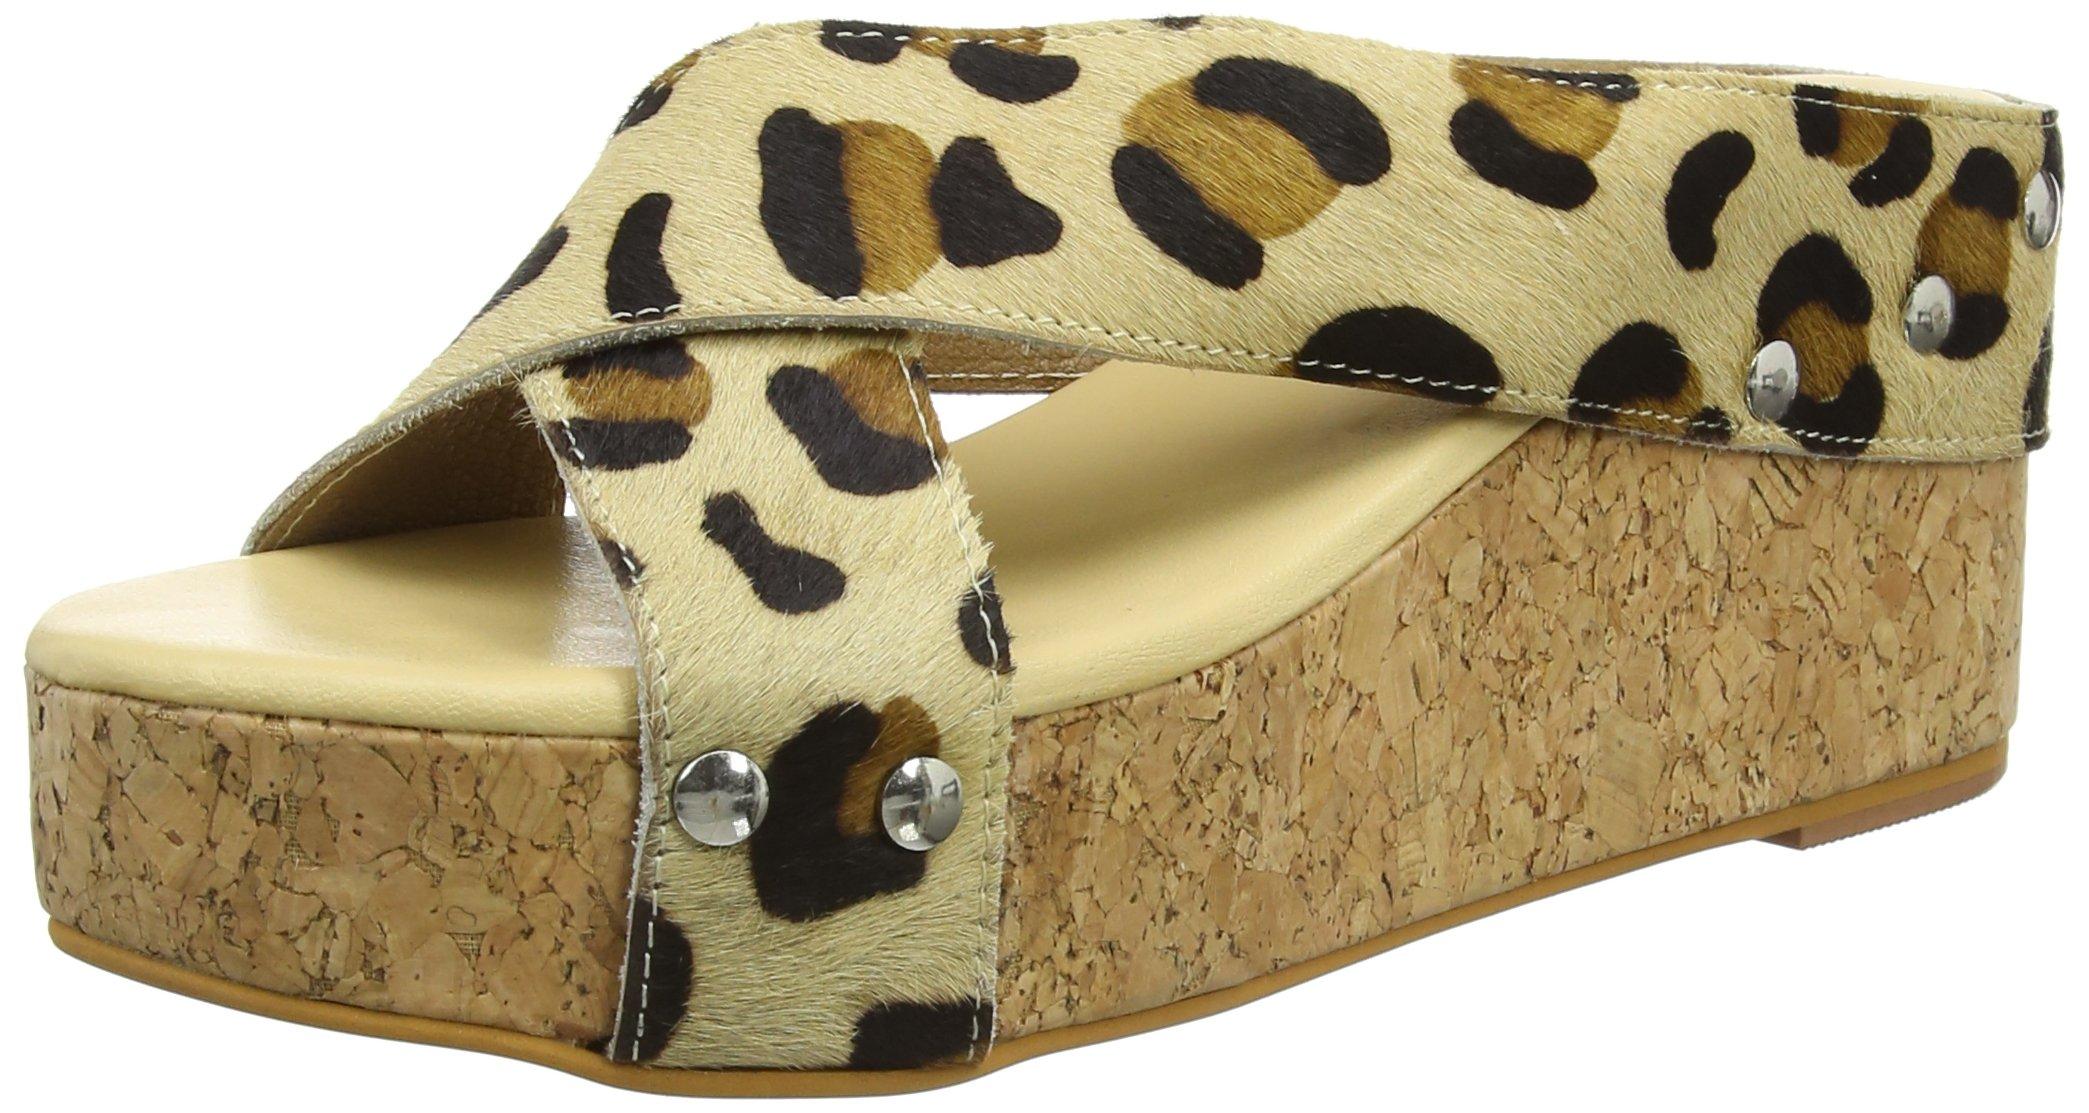 Wedge Sandals Tantra Animal PrintBrownleopard37 FemmeSandalesLeather Espadrille b6y7IYfgv